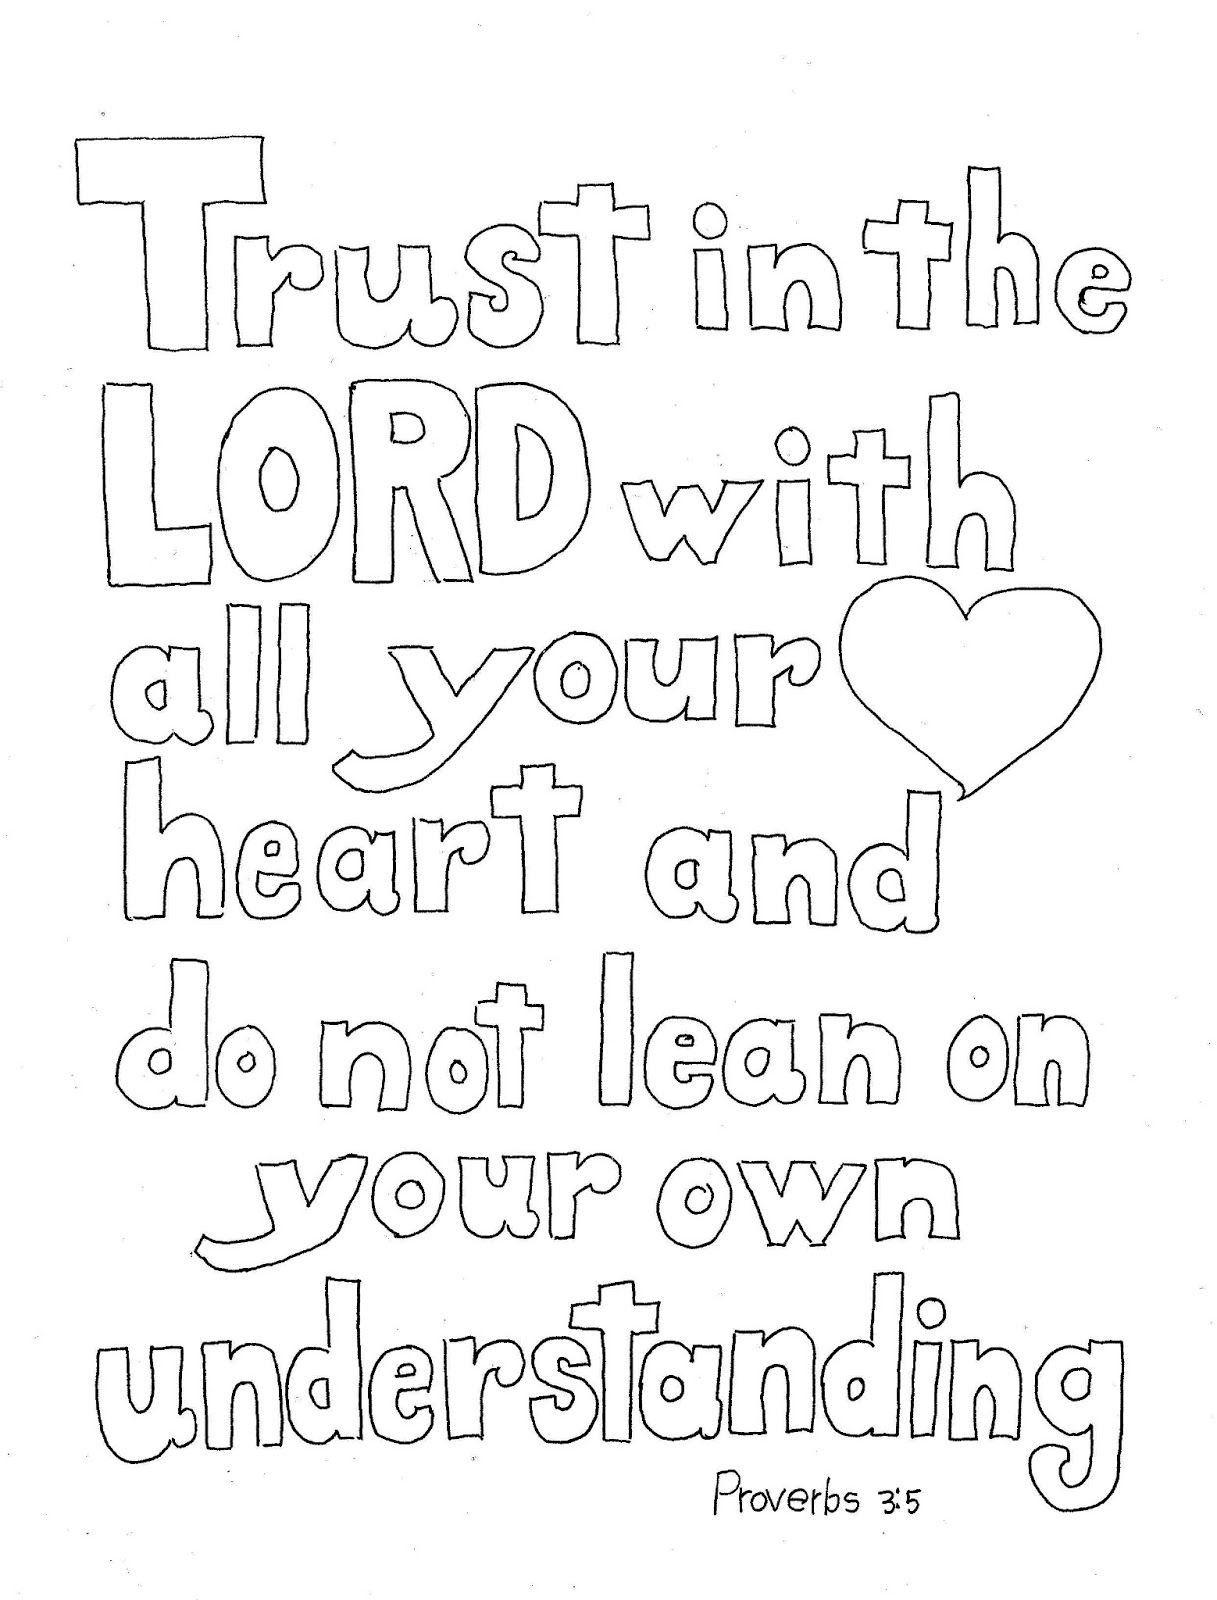 Proverbs 3 5 6 Coloring Page Proverbs 3 5 6 Coloring Page